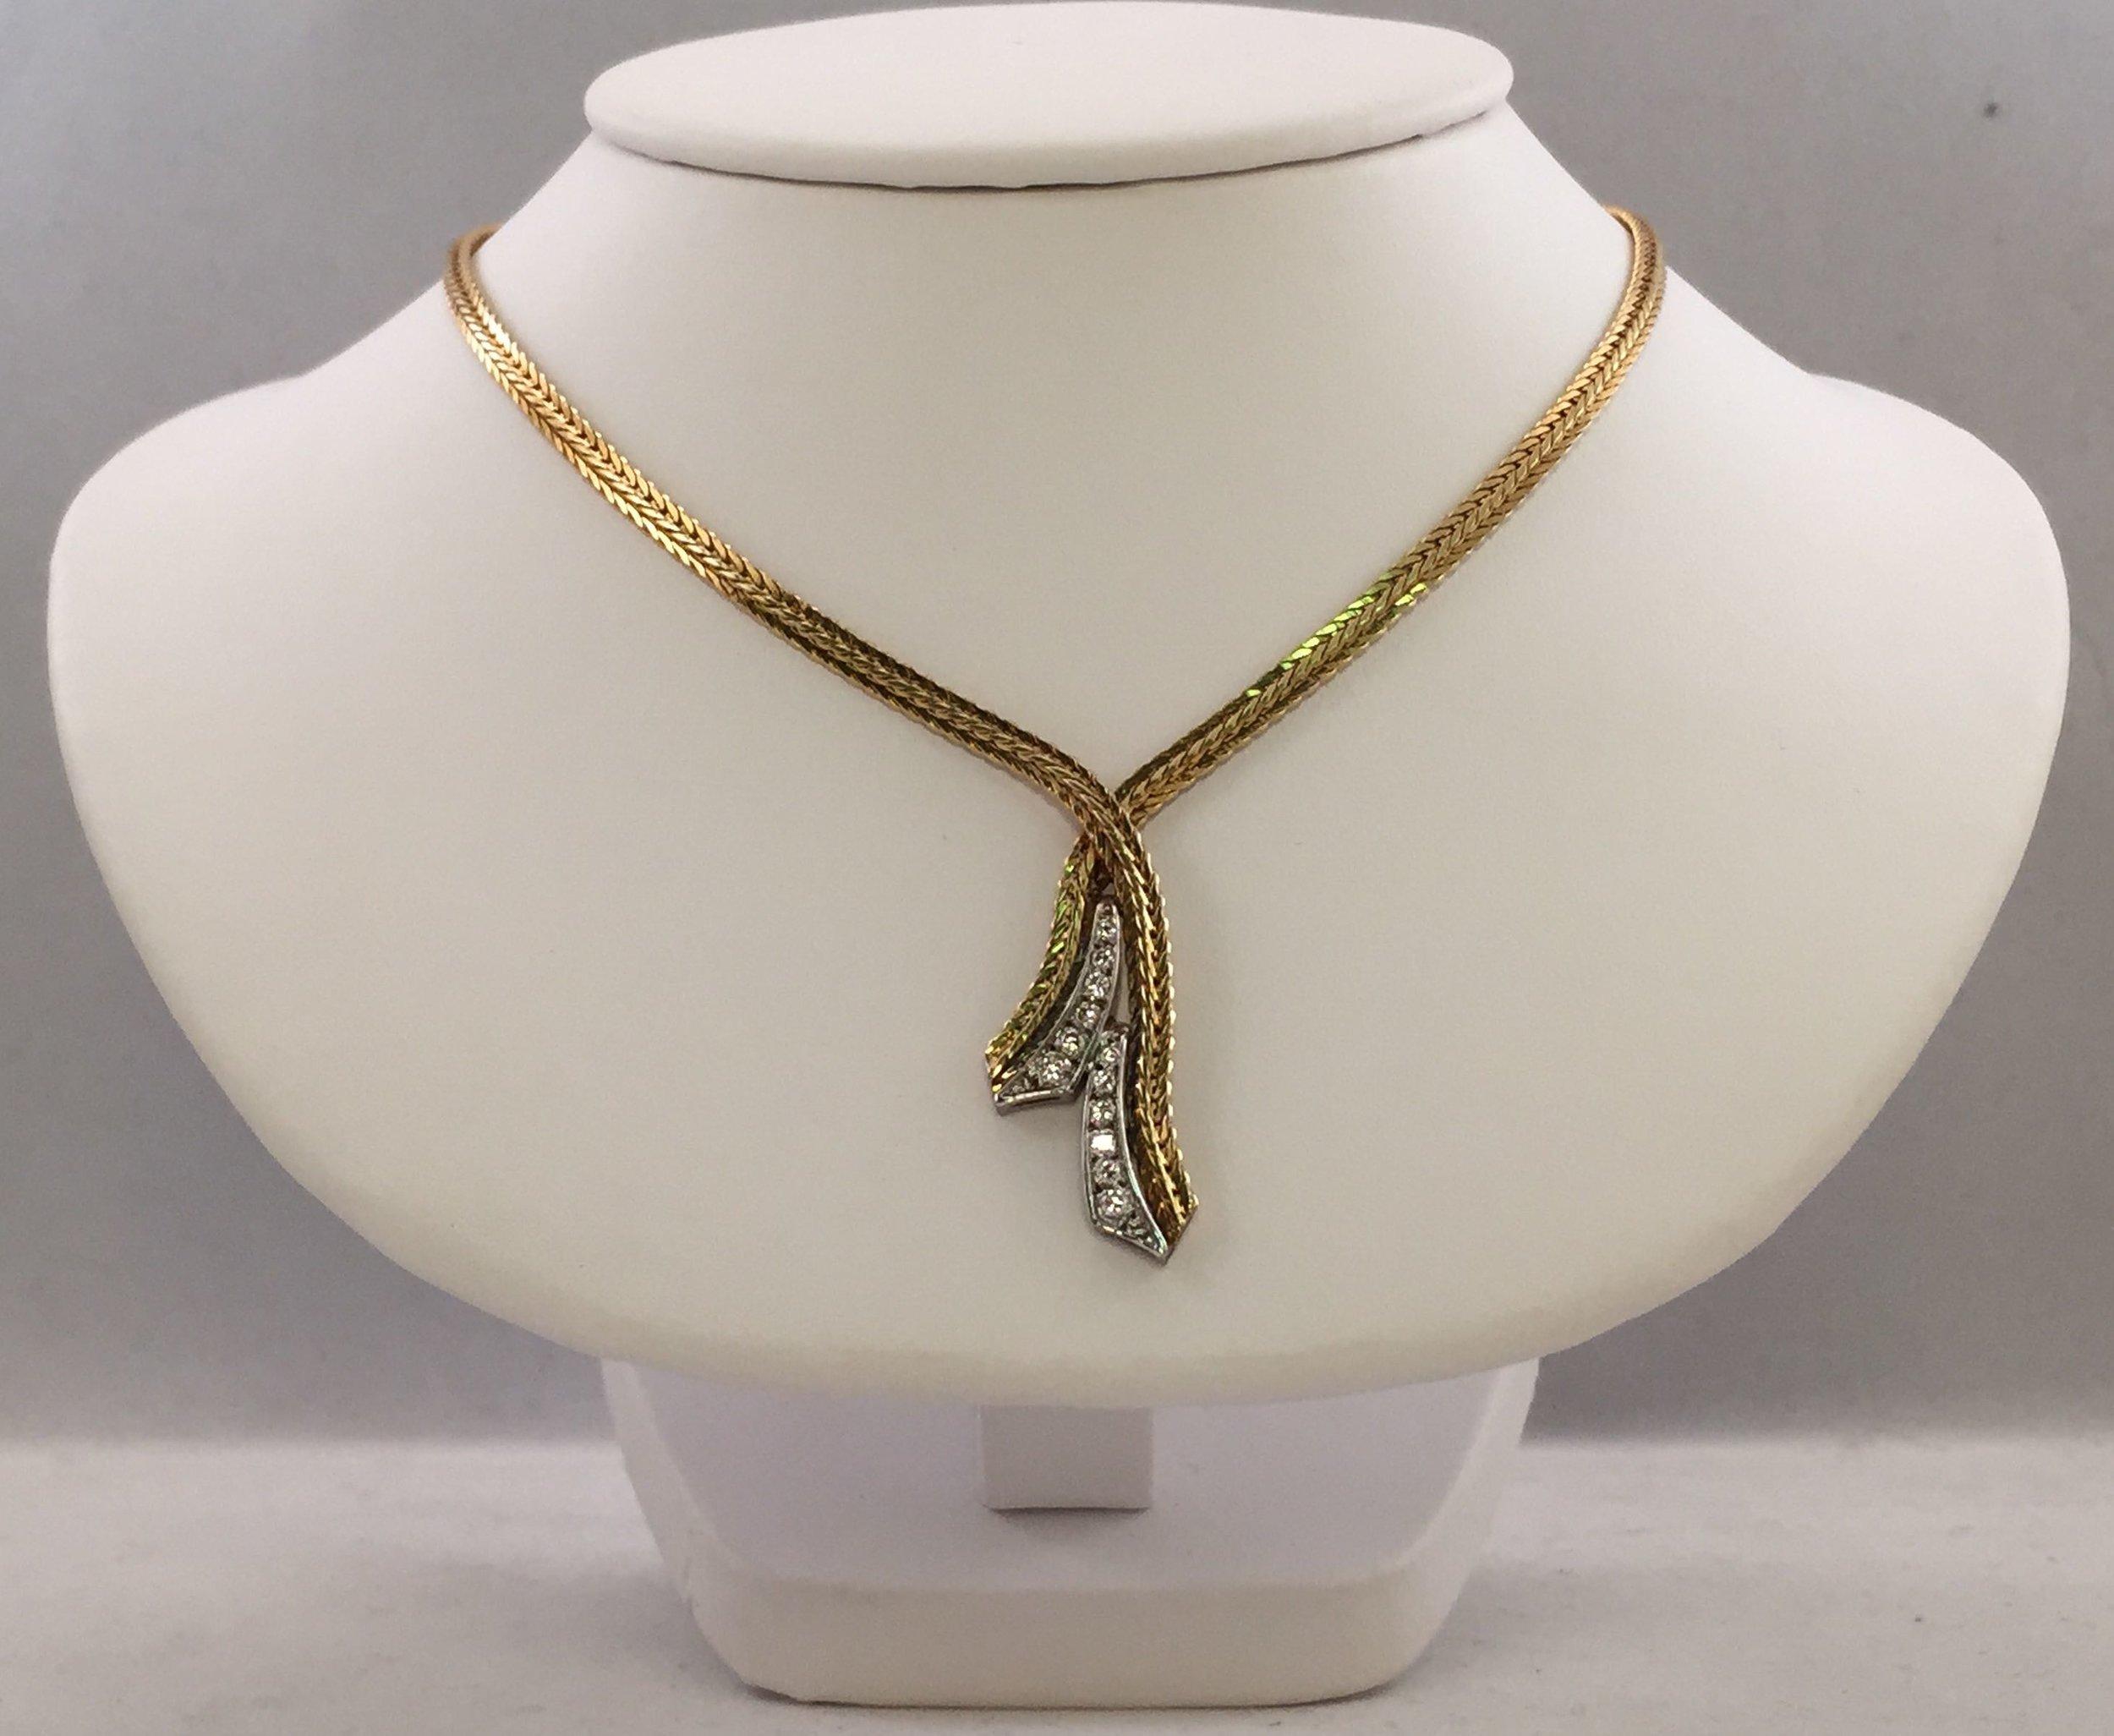 necklace_20143152.jpg